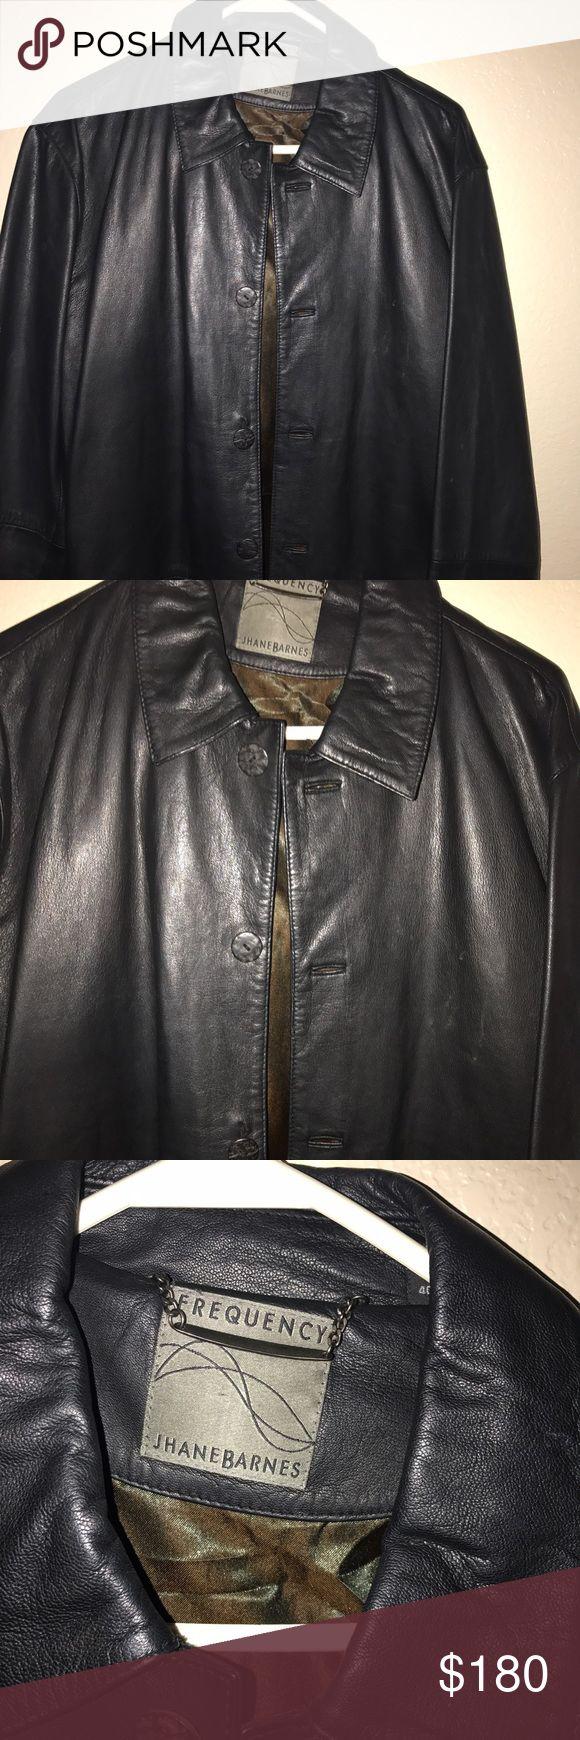 Men's blazer Men's leather blazer in excellent condition . Frequency Jhane Barnes  Jackets & Coats